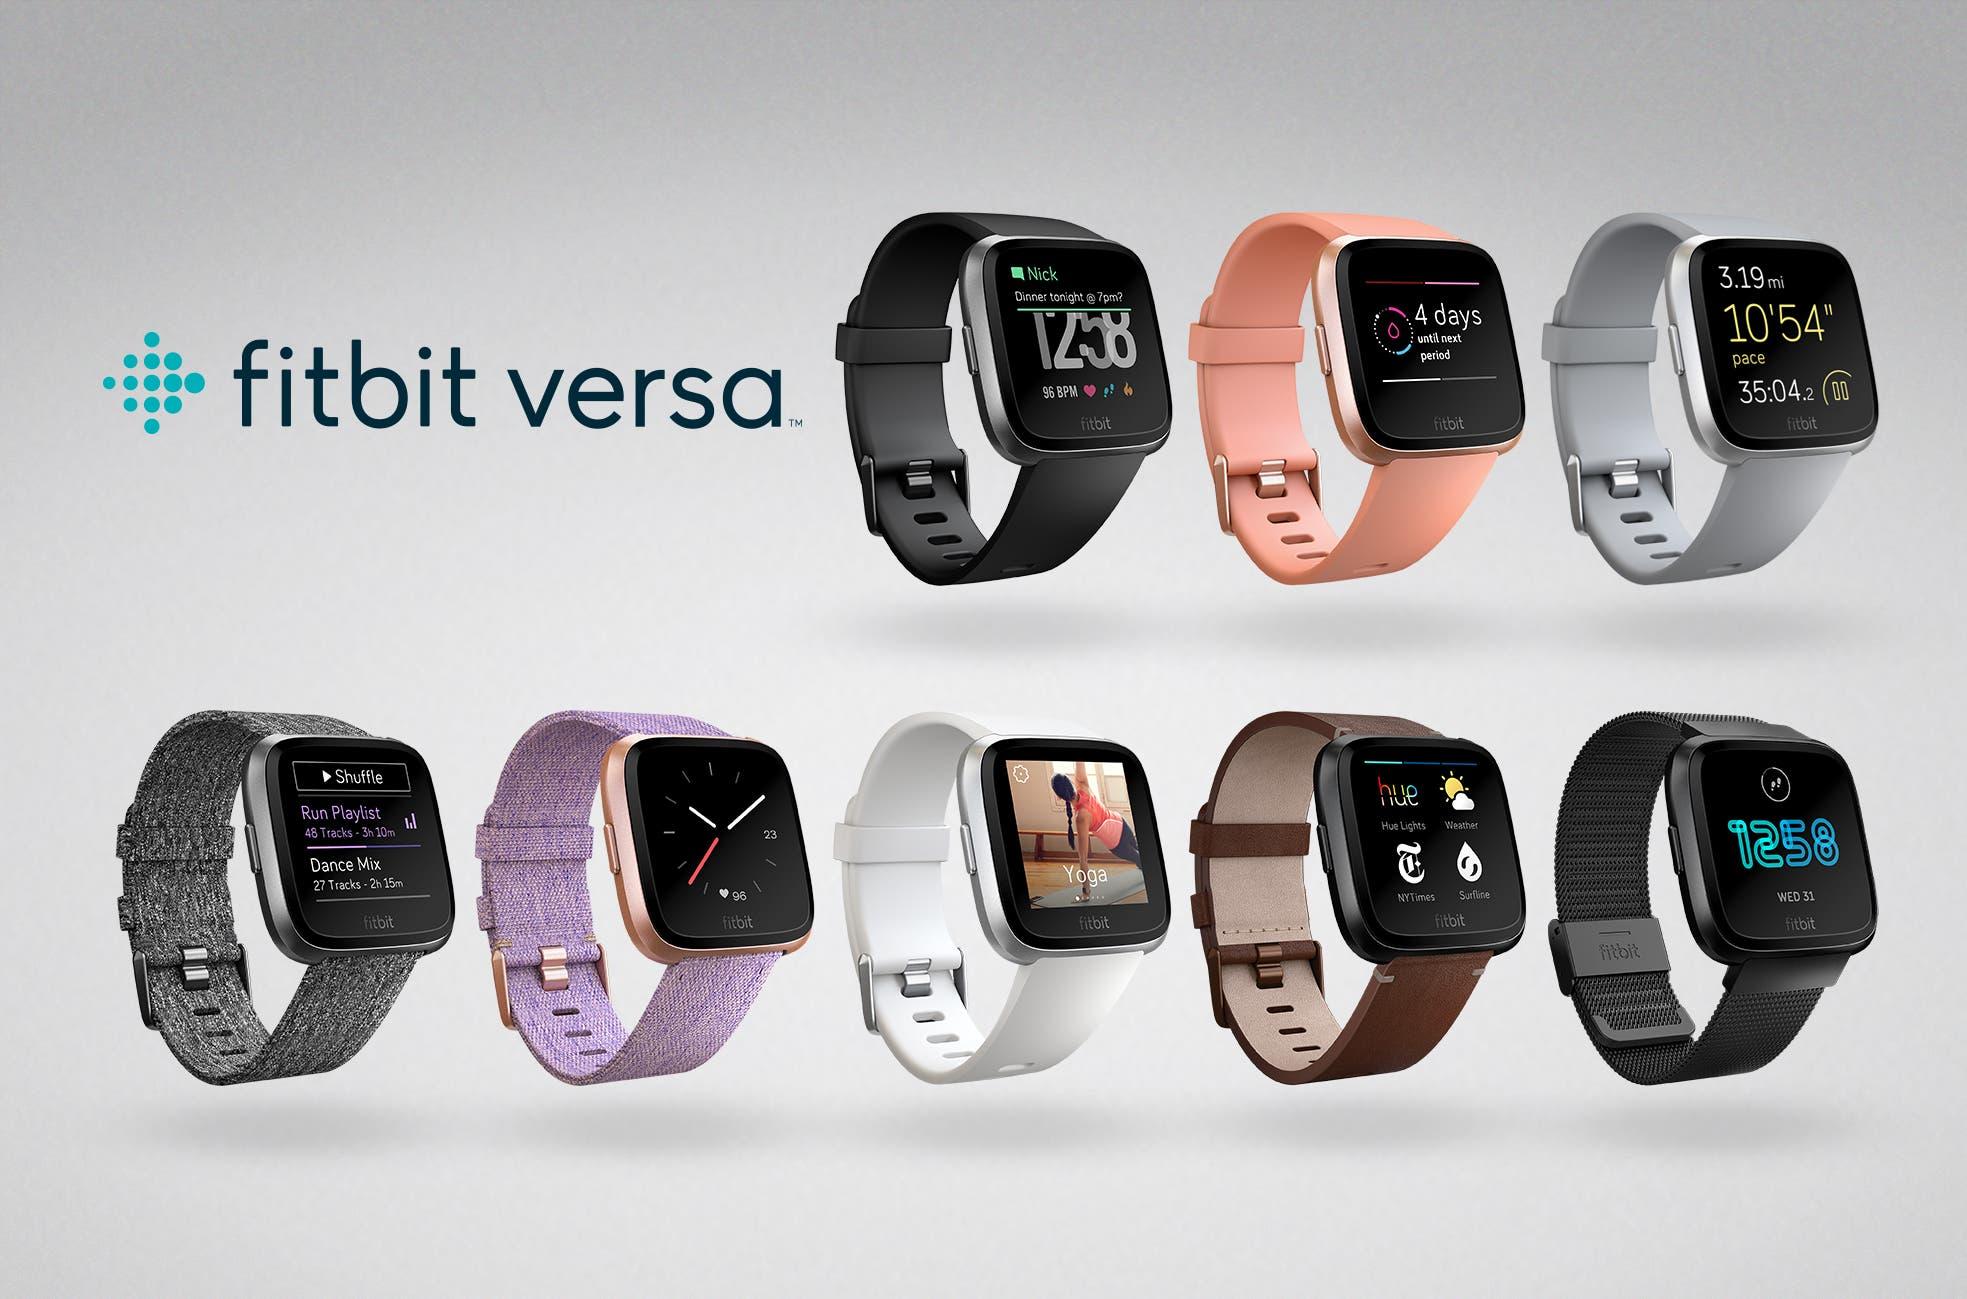 FitBit Versa Lineup